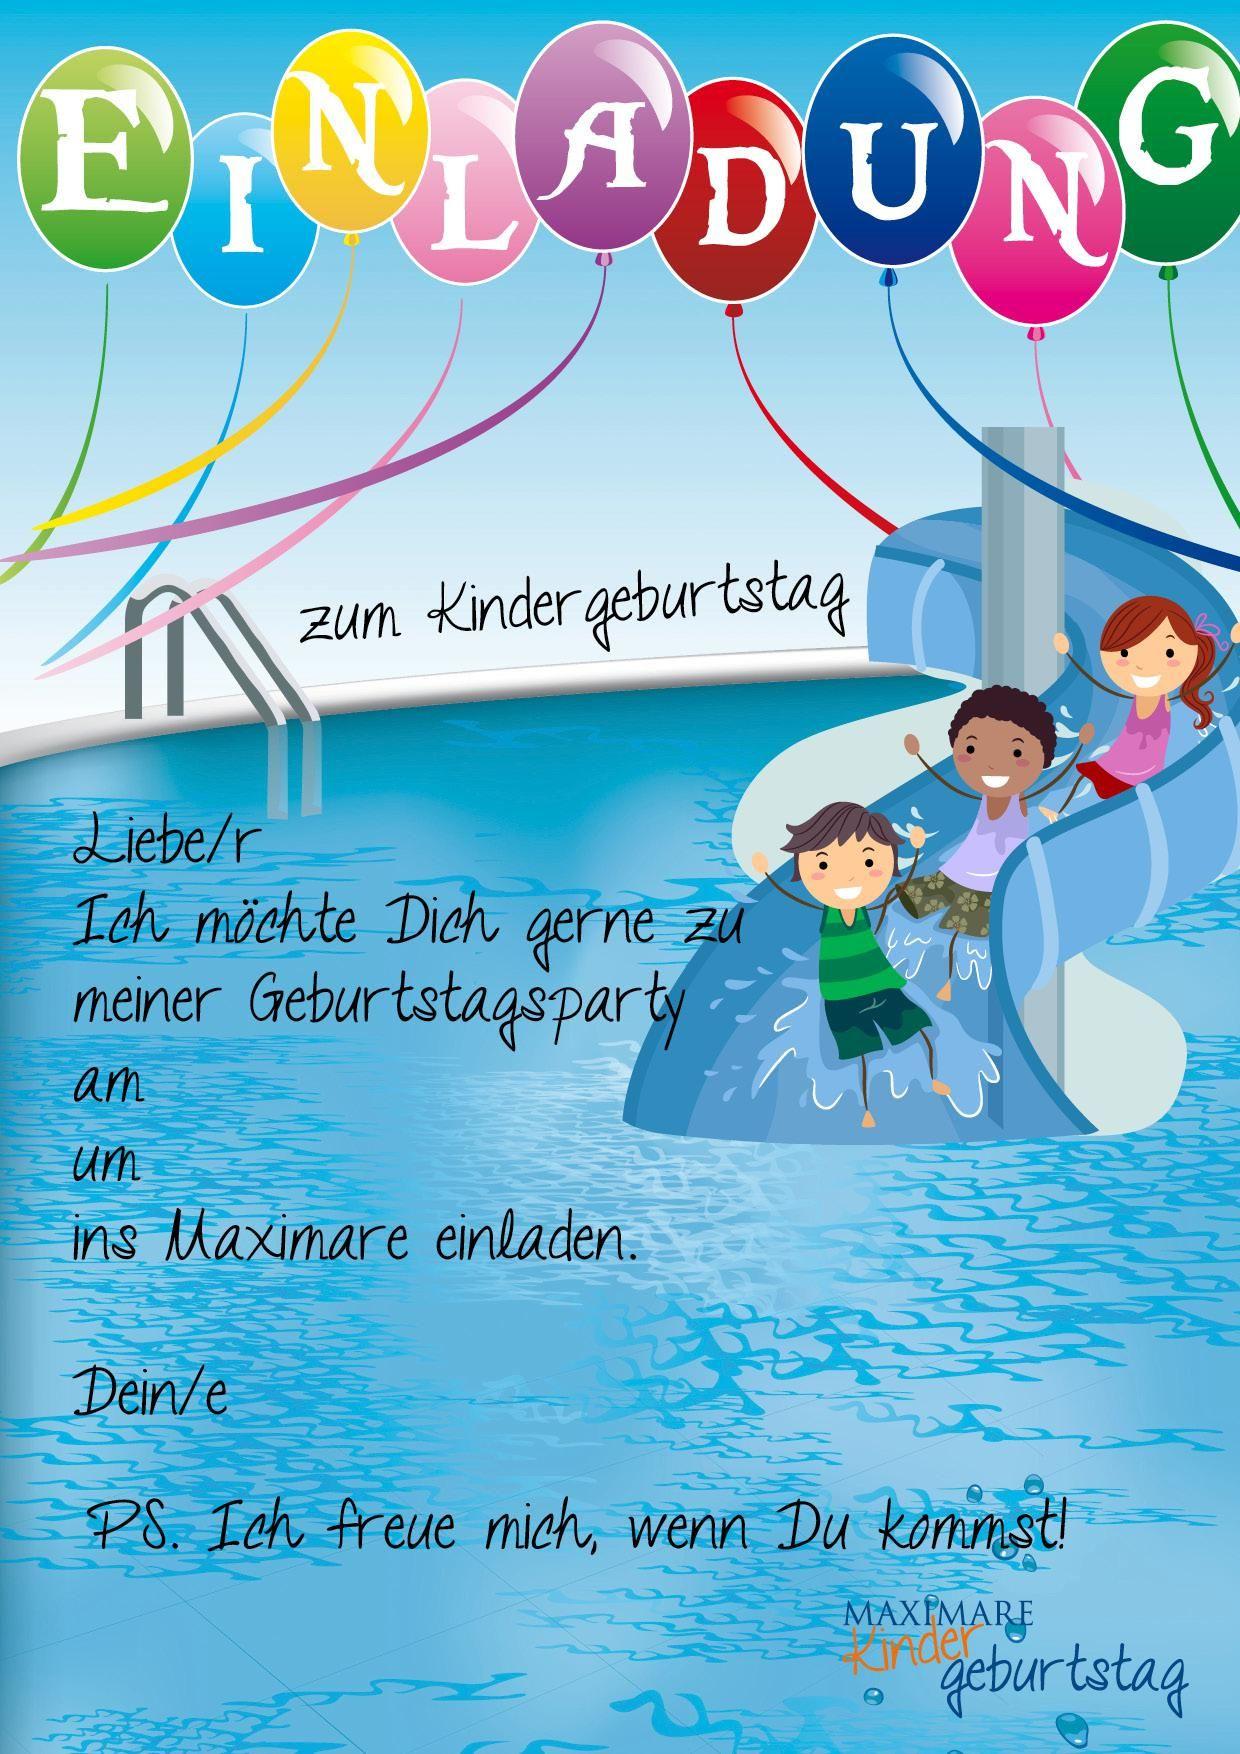 The Awesome Kindergeburtstag Einladung Fur Schwimmbad Dig Einladungskarten Kindergeburtstag Text Einladungskarten Kindergeburtstag Geburtstags Einladung Kinder